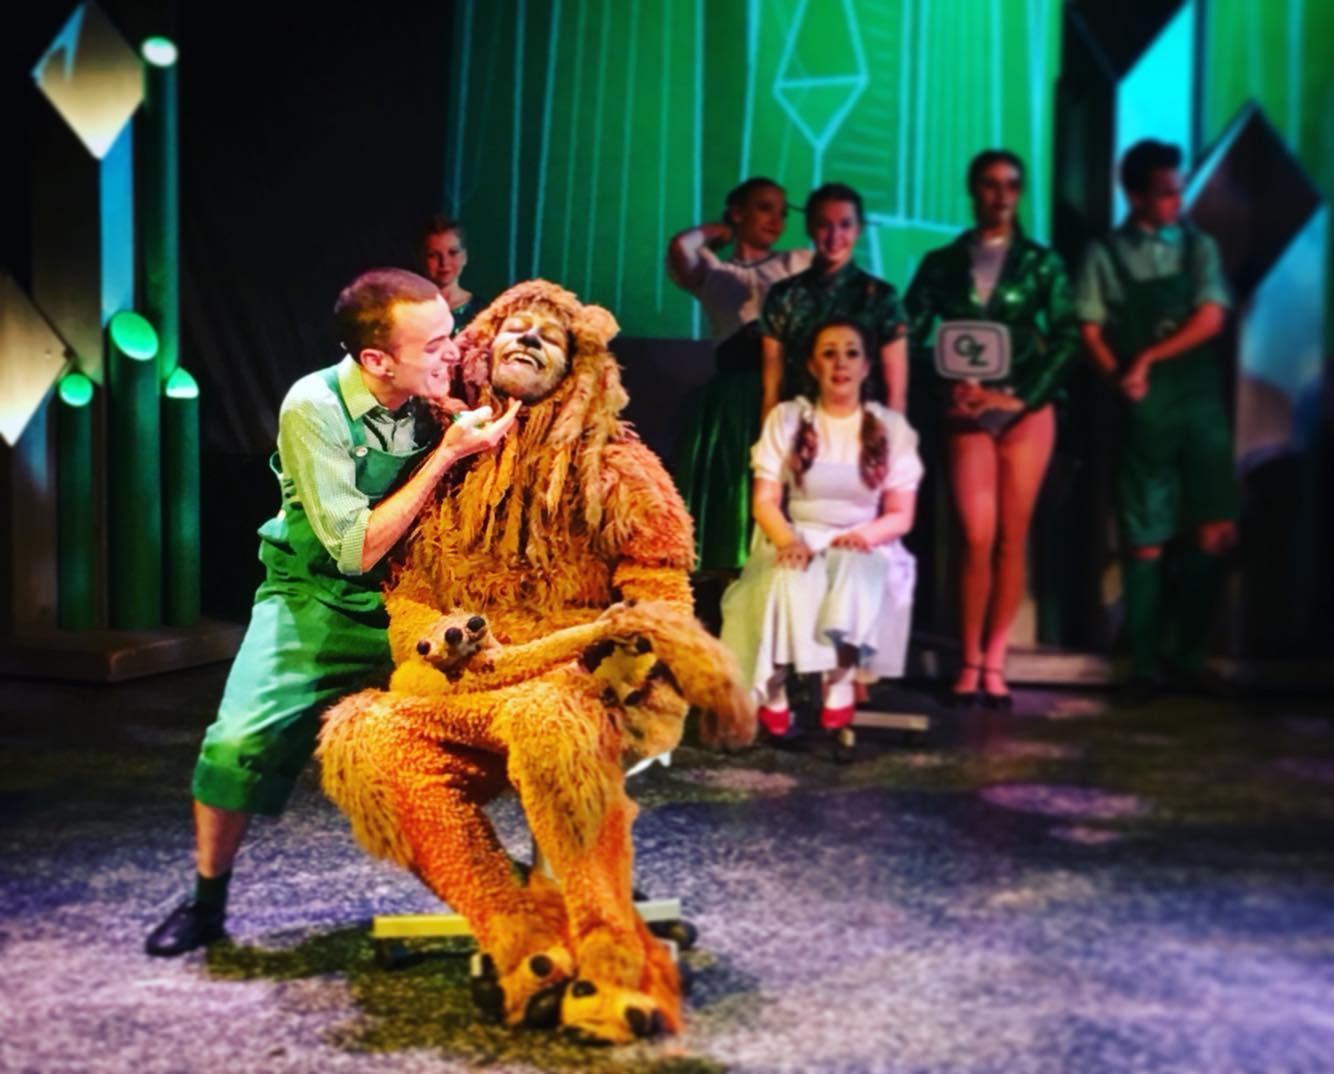 Luke Simnett in The Wizard of Oz